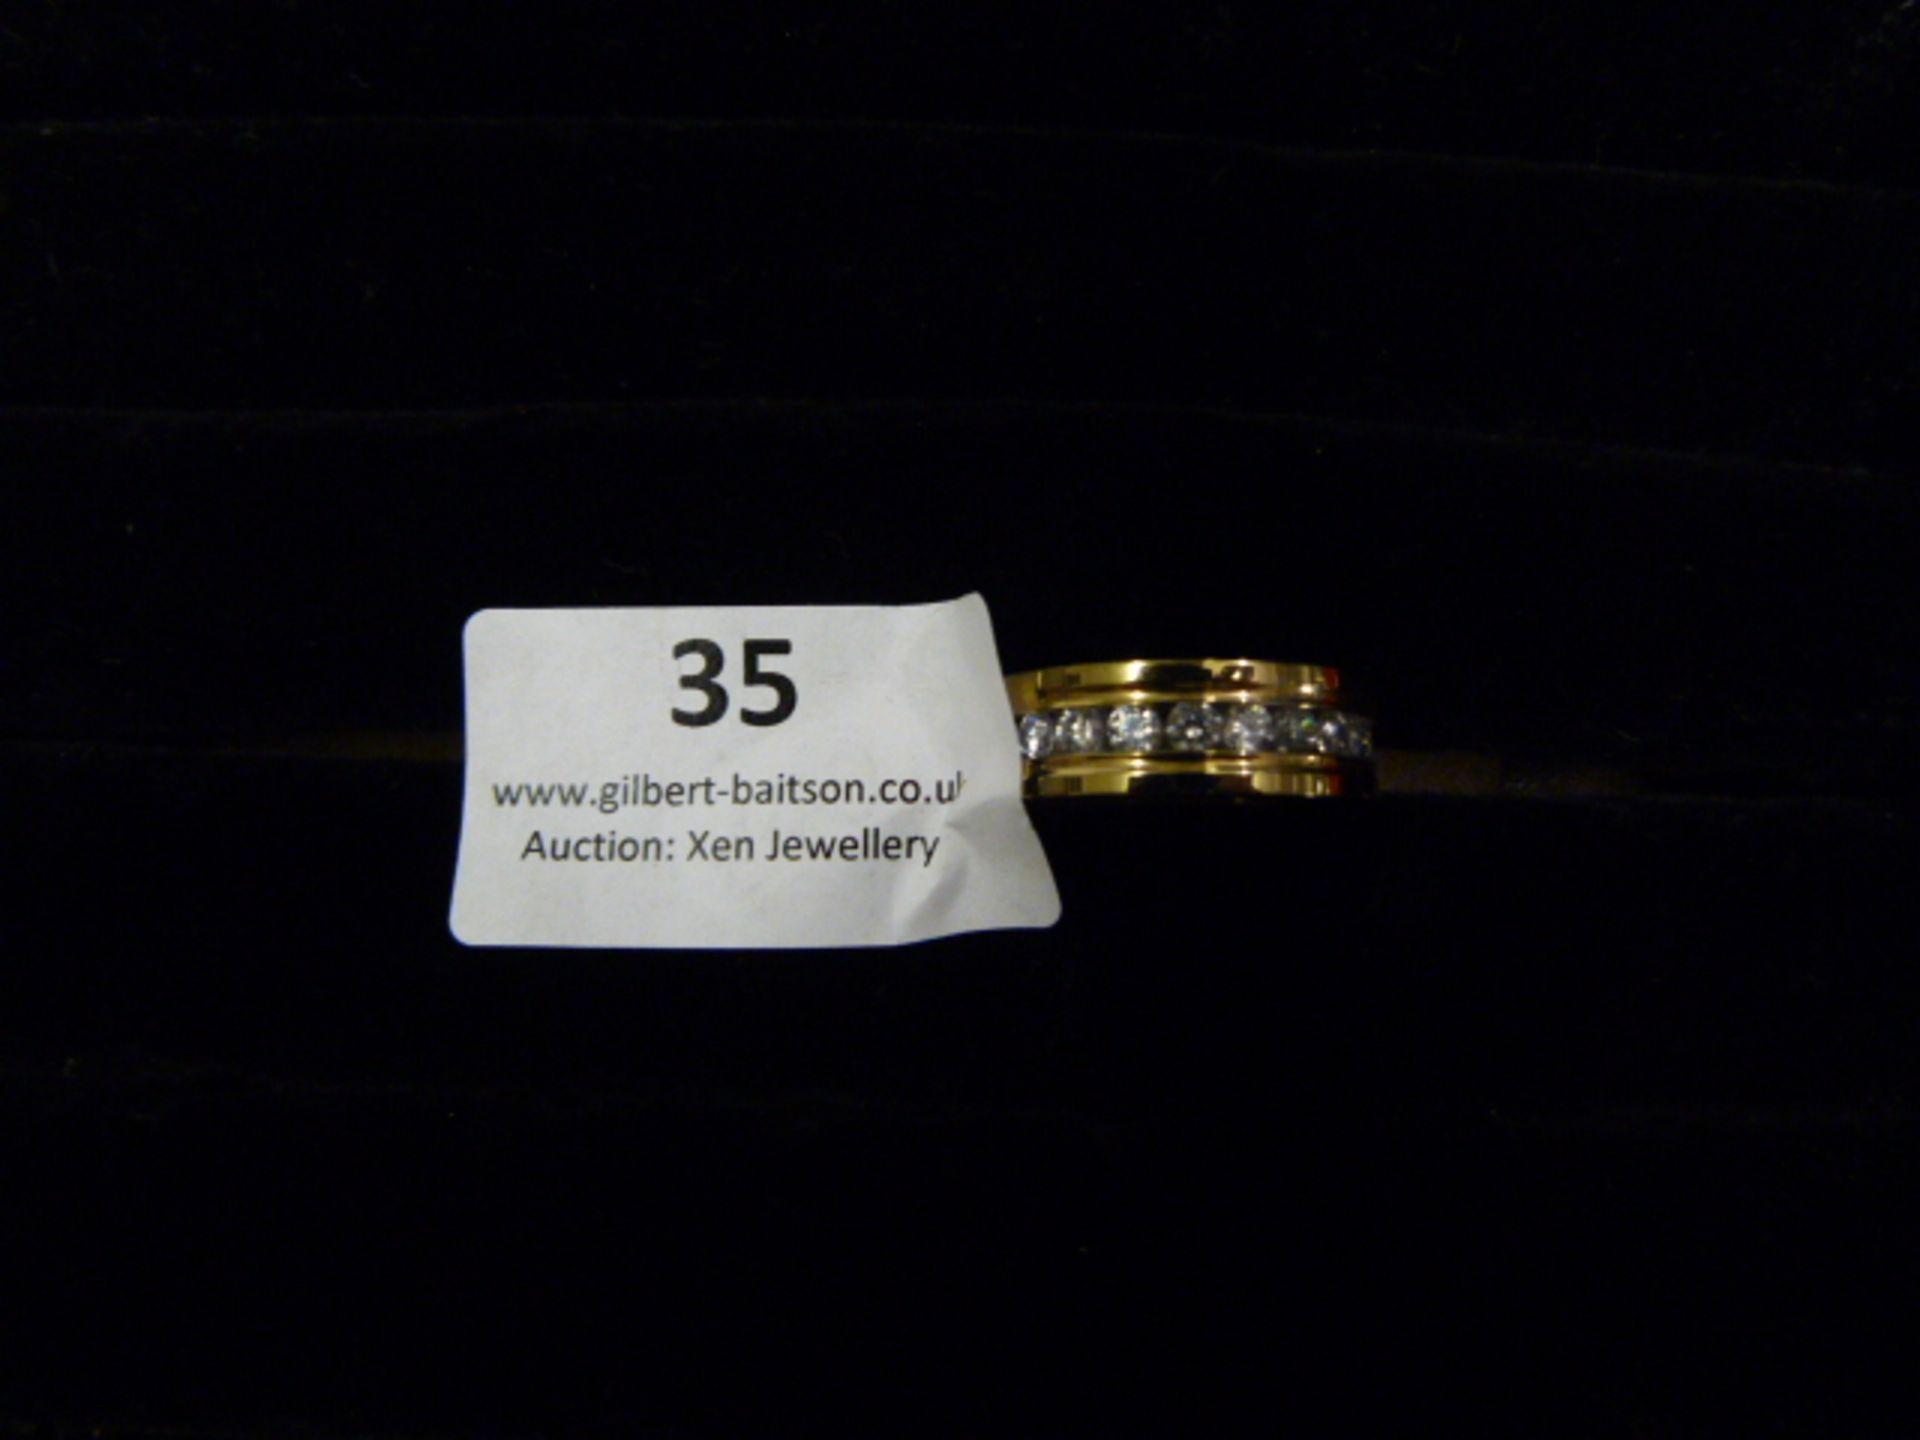 Lot 35 - *Edblad Gold Ring with CZ Stones